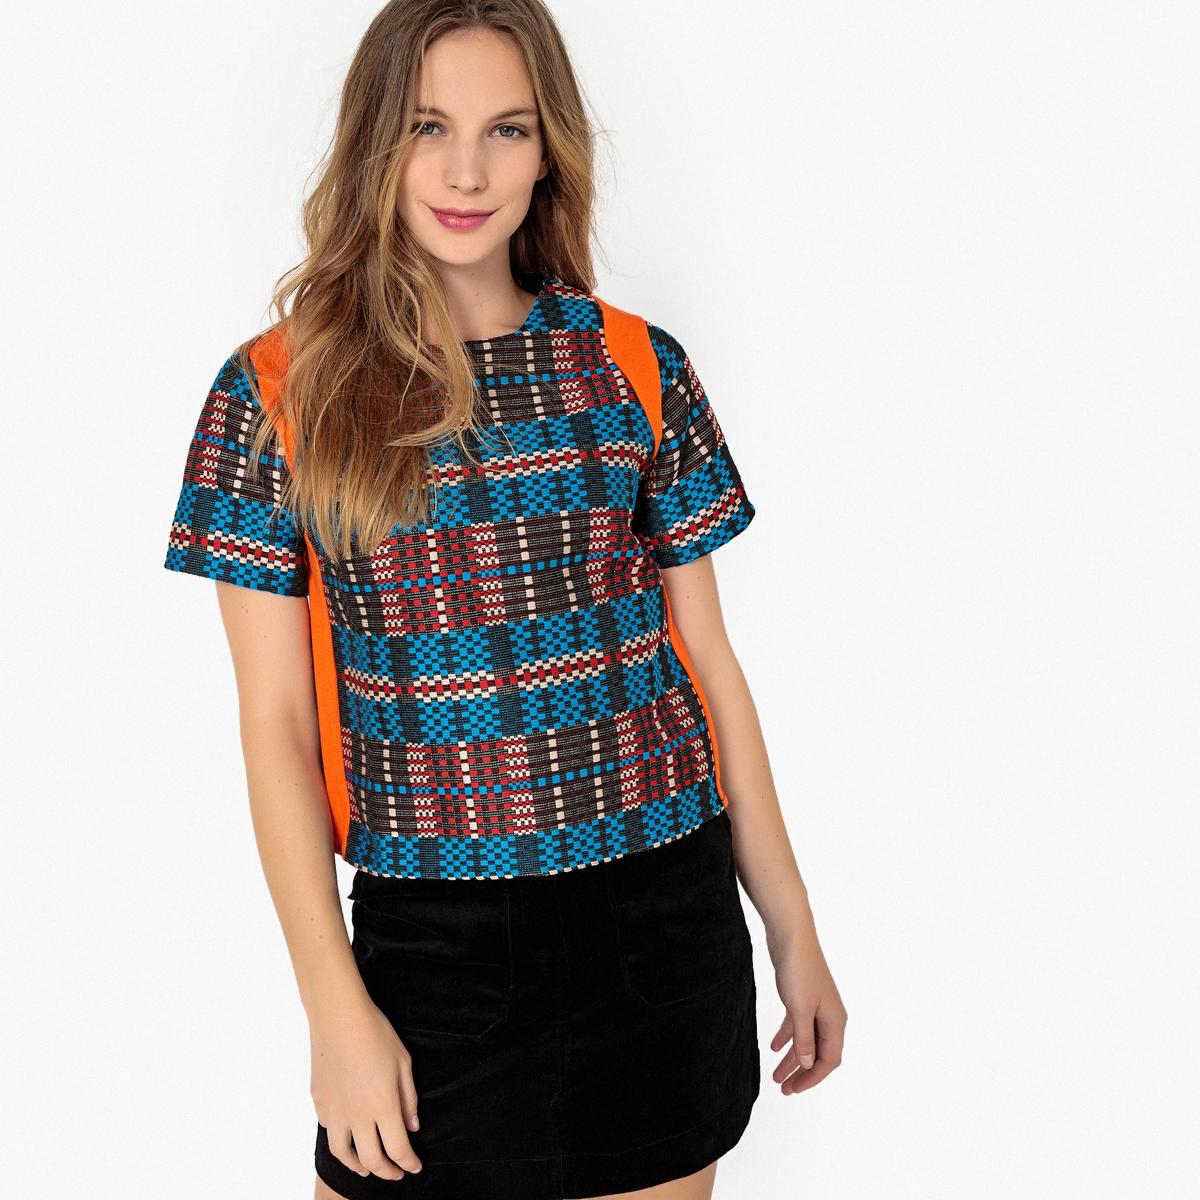 Blusa jacquard multicolor, mangas curtas